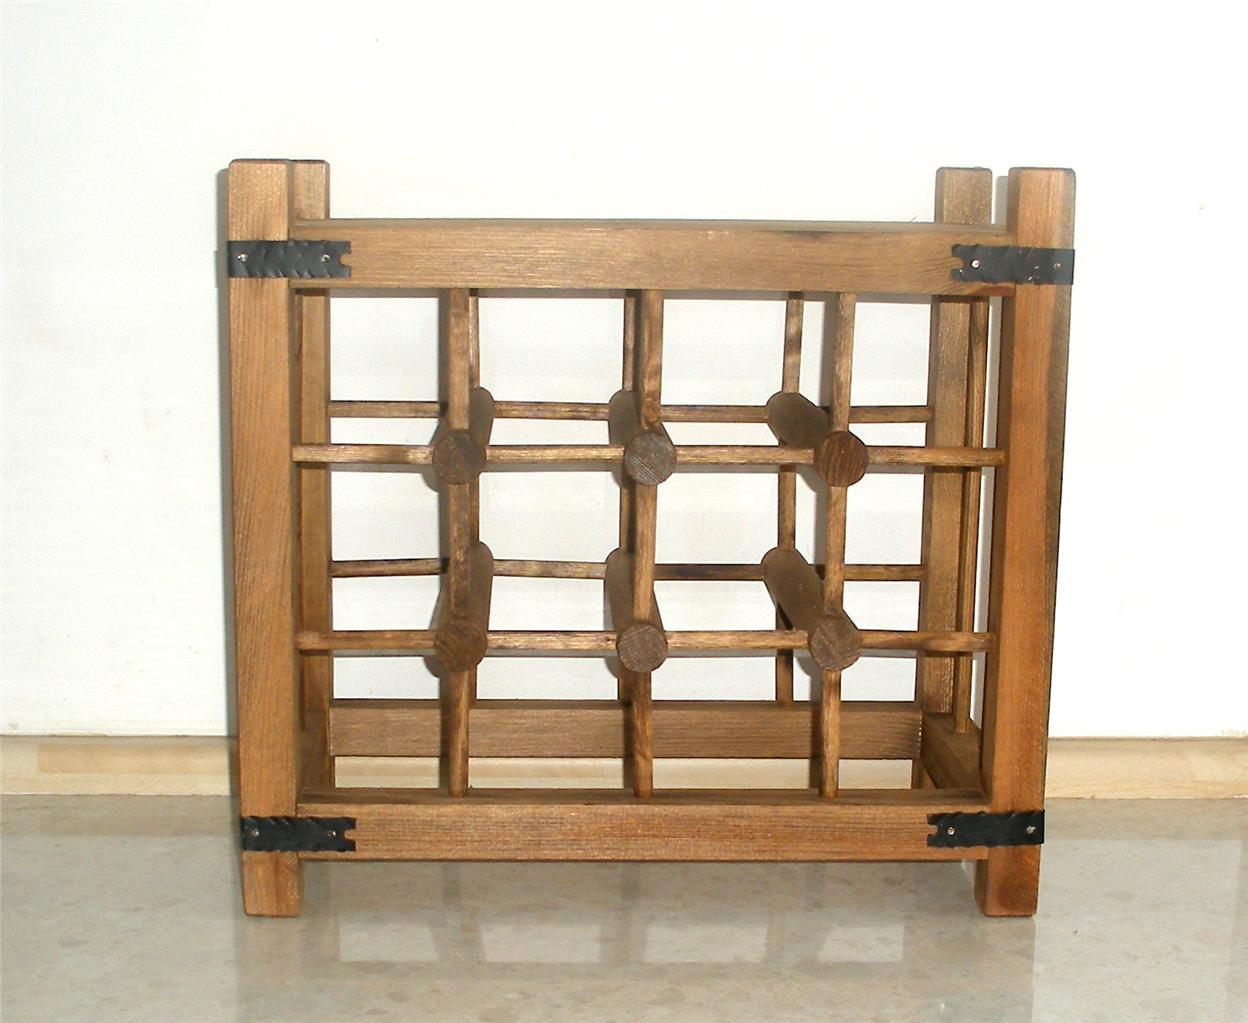 Antique Wooden Racks ~ Wooden wine rack bottles antique pine walnut stained